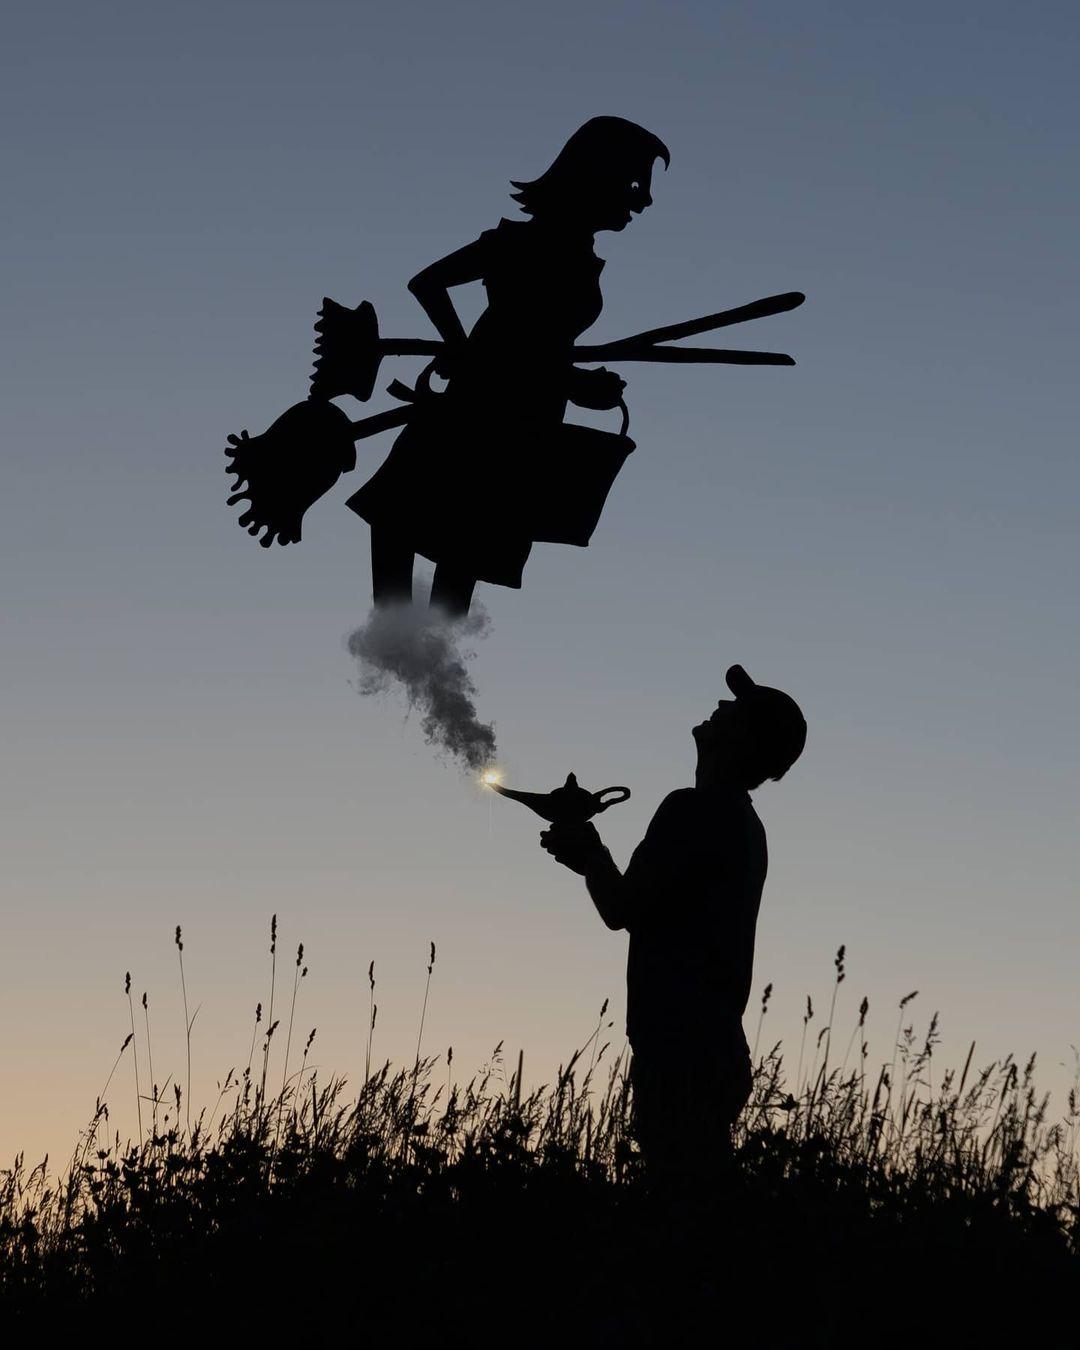 silhouette photography cardboard cutout goblin by john marshall